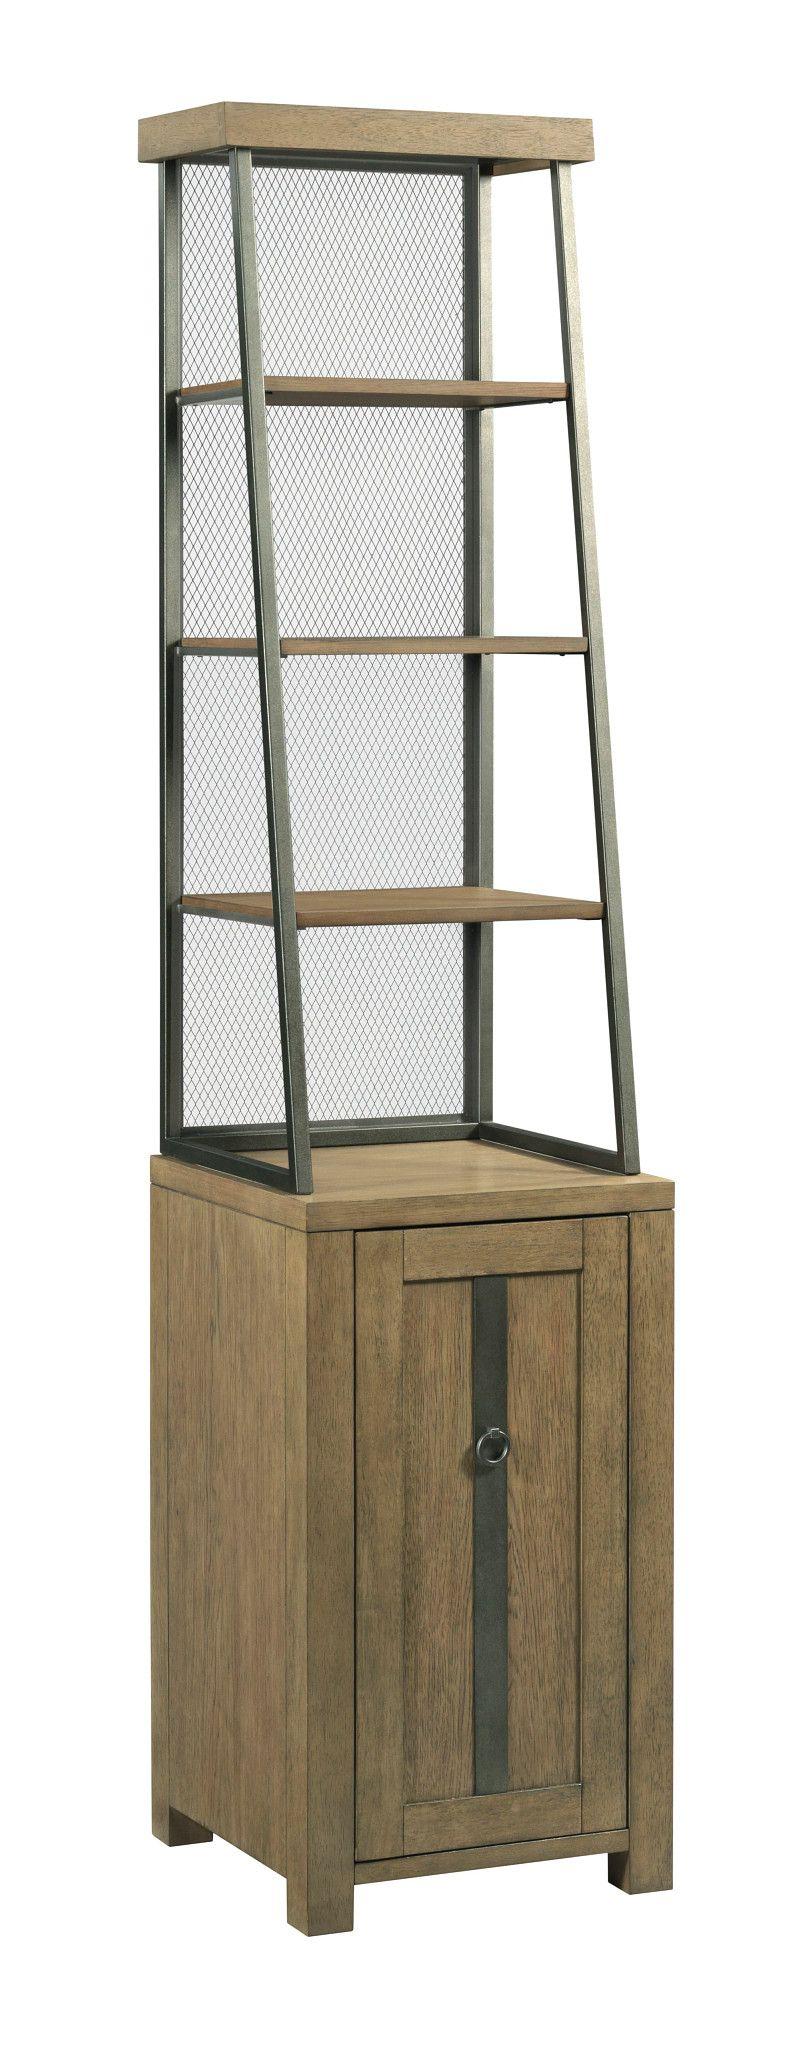 Maya Pier Cabinet by Hammary at Jacksonville Furniture Mart